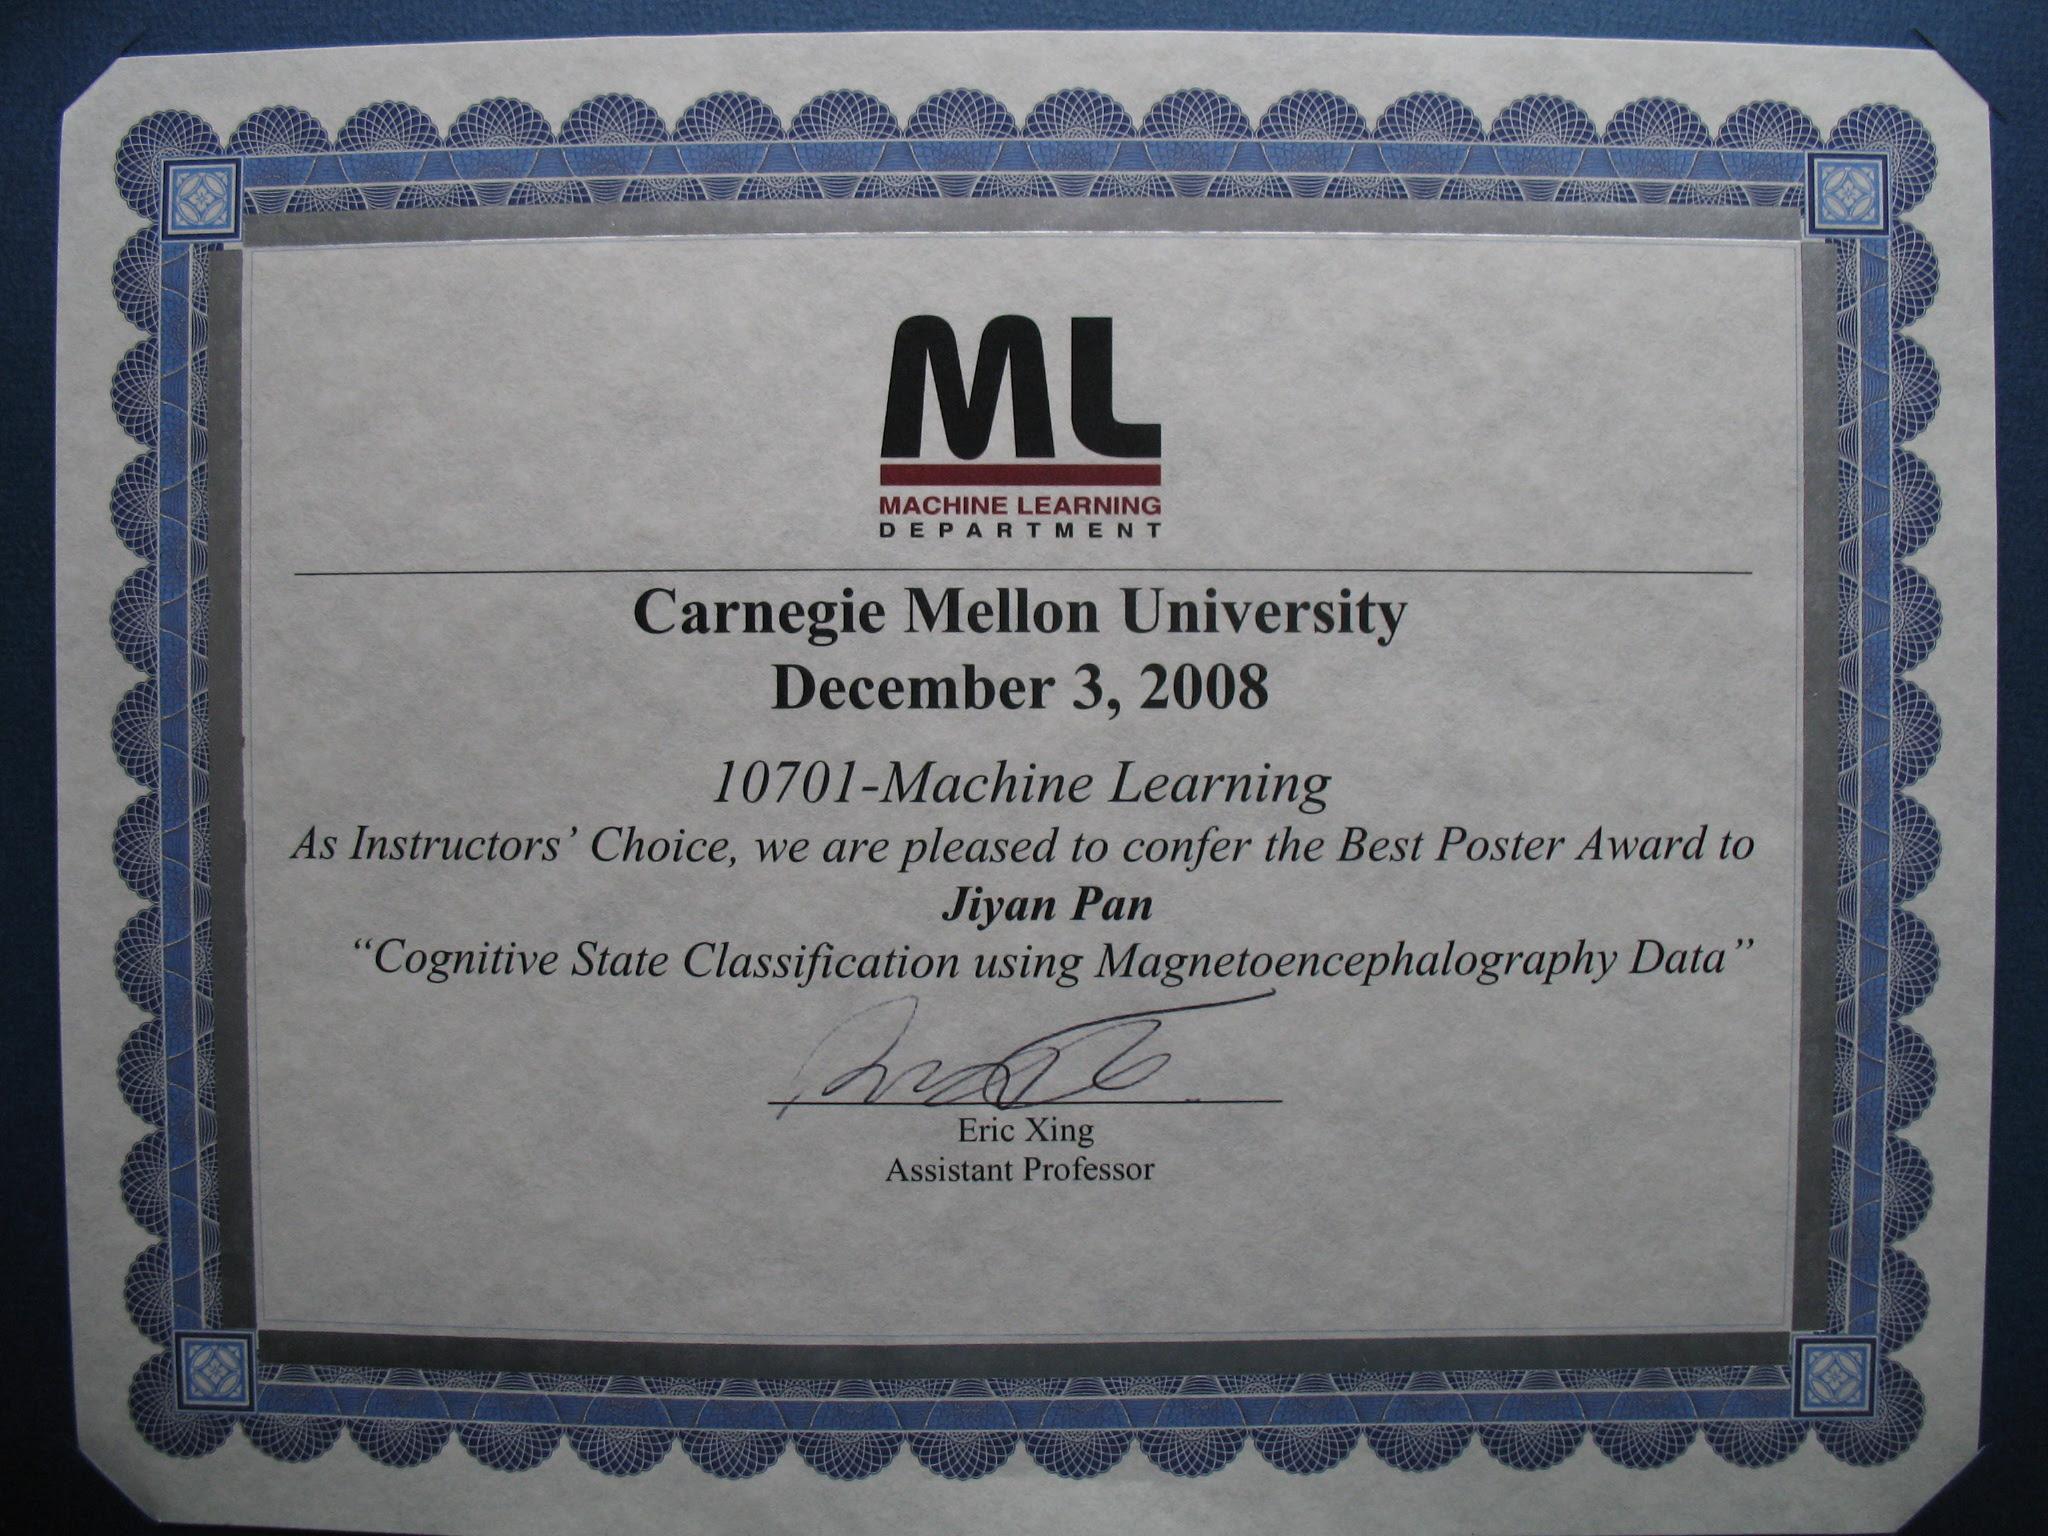 Ms In Machine Learning Carnegie Mellon University - Quantum